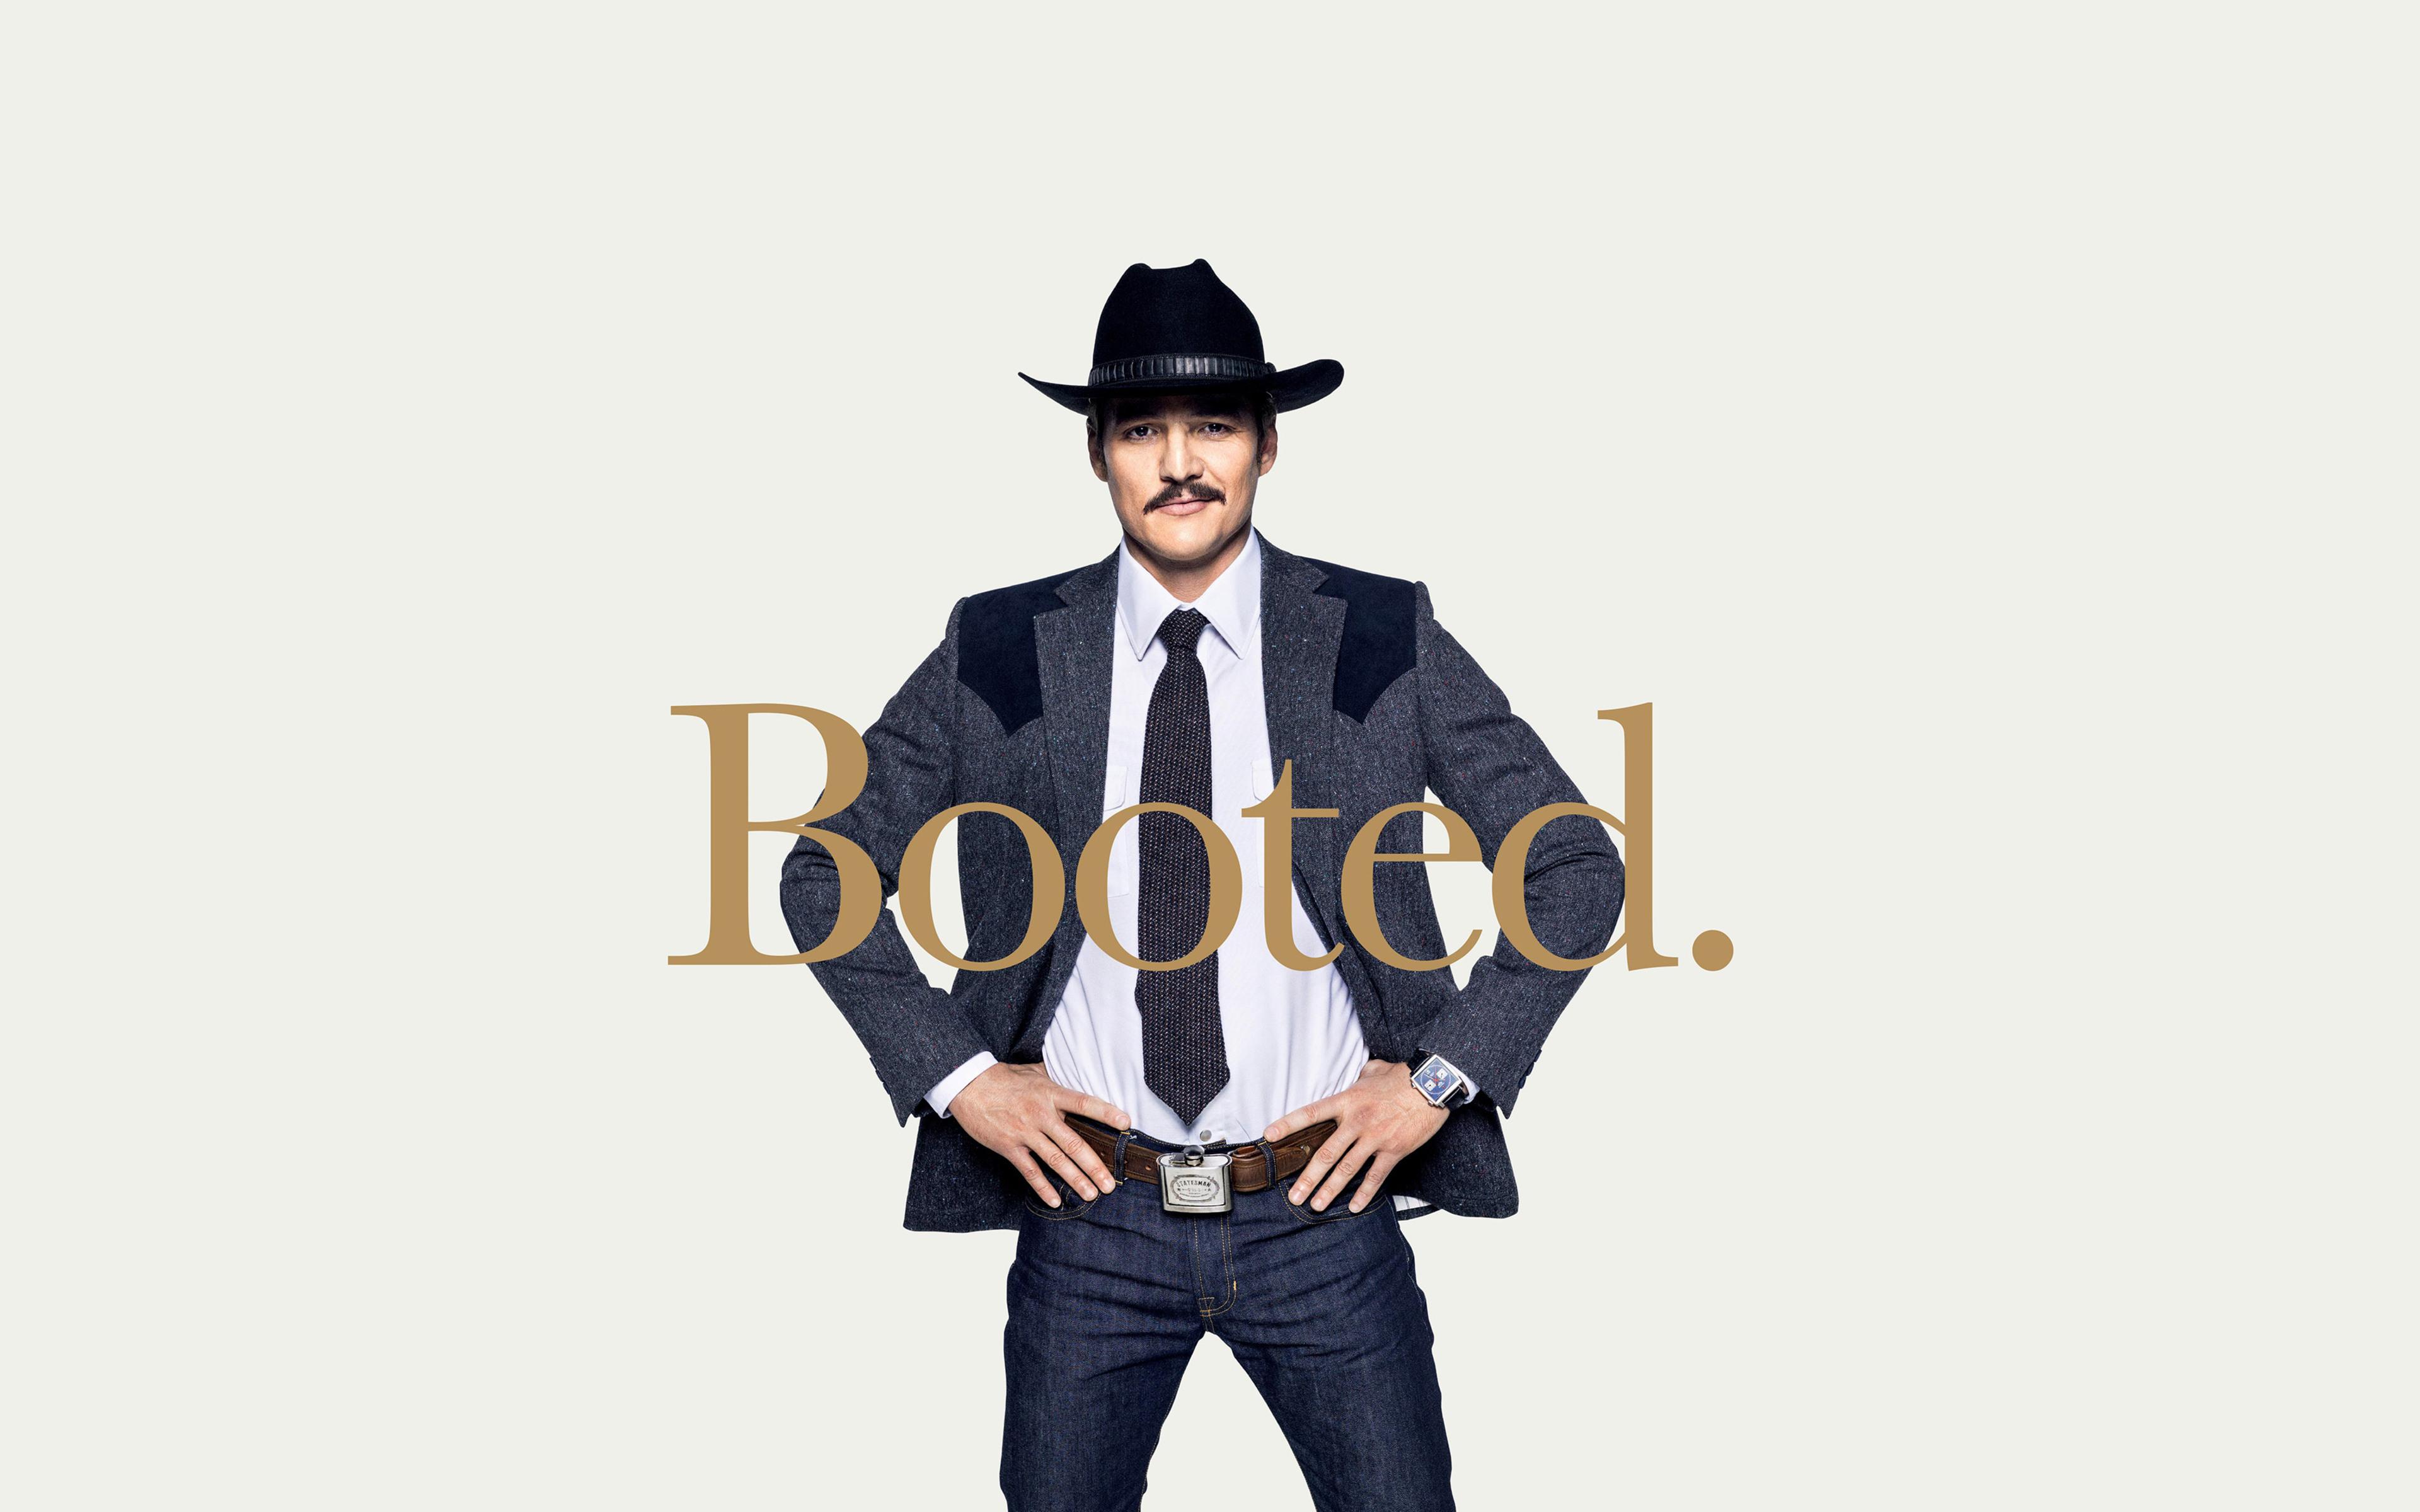 pedro-pascal-as-agent-whiskey-kingsman-the-golden-circle-od.jpg